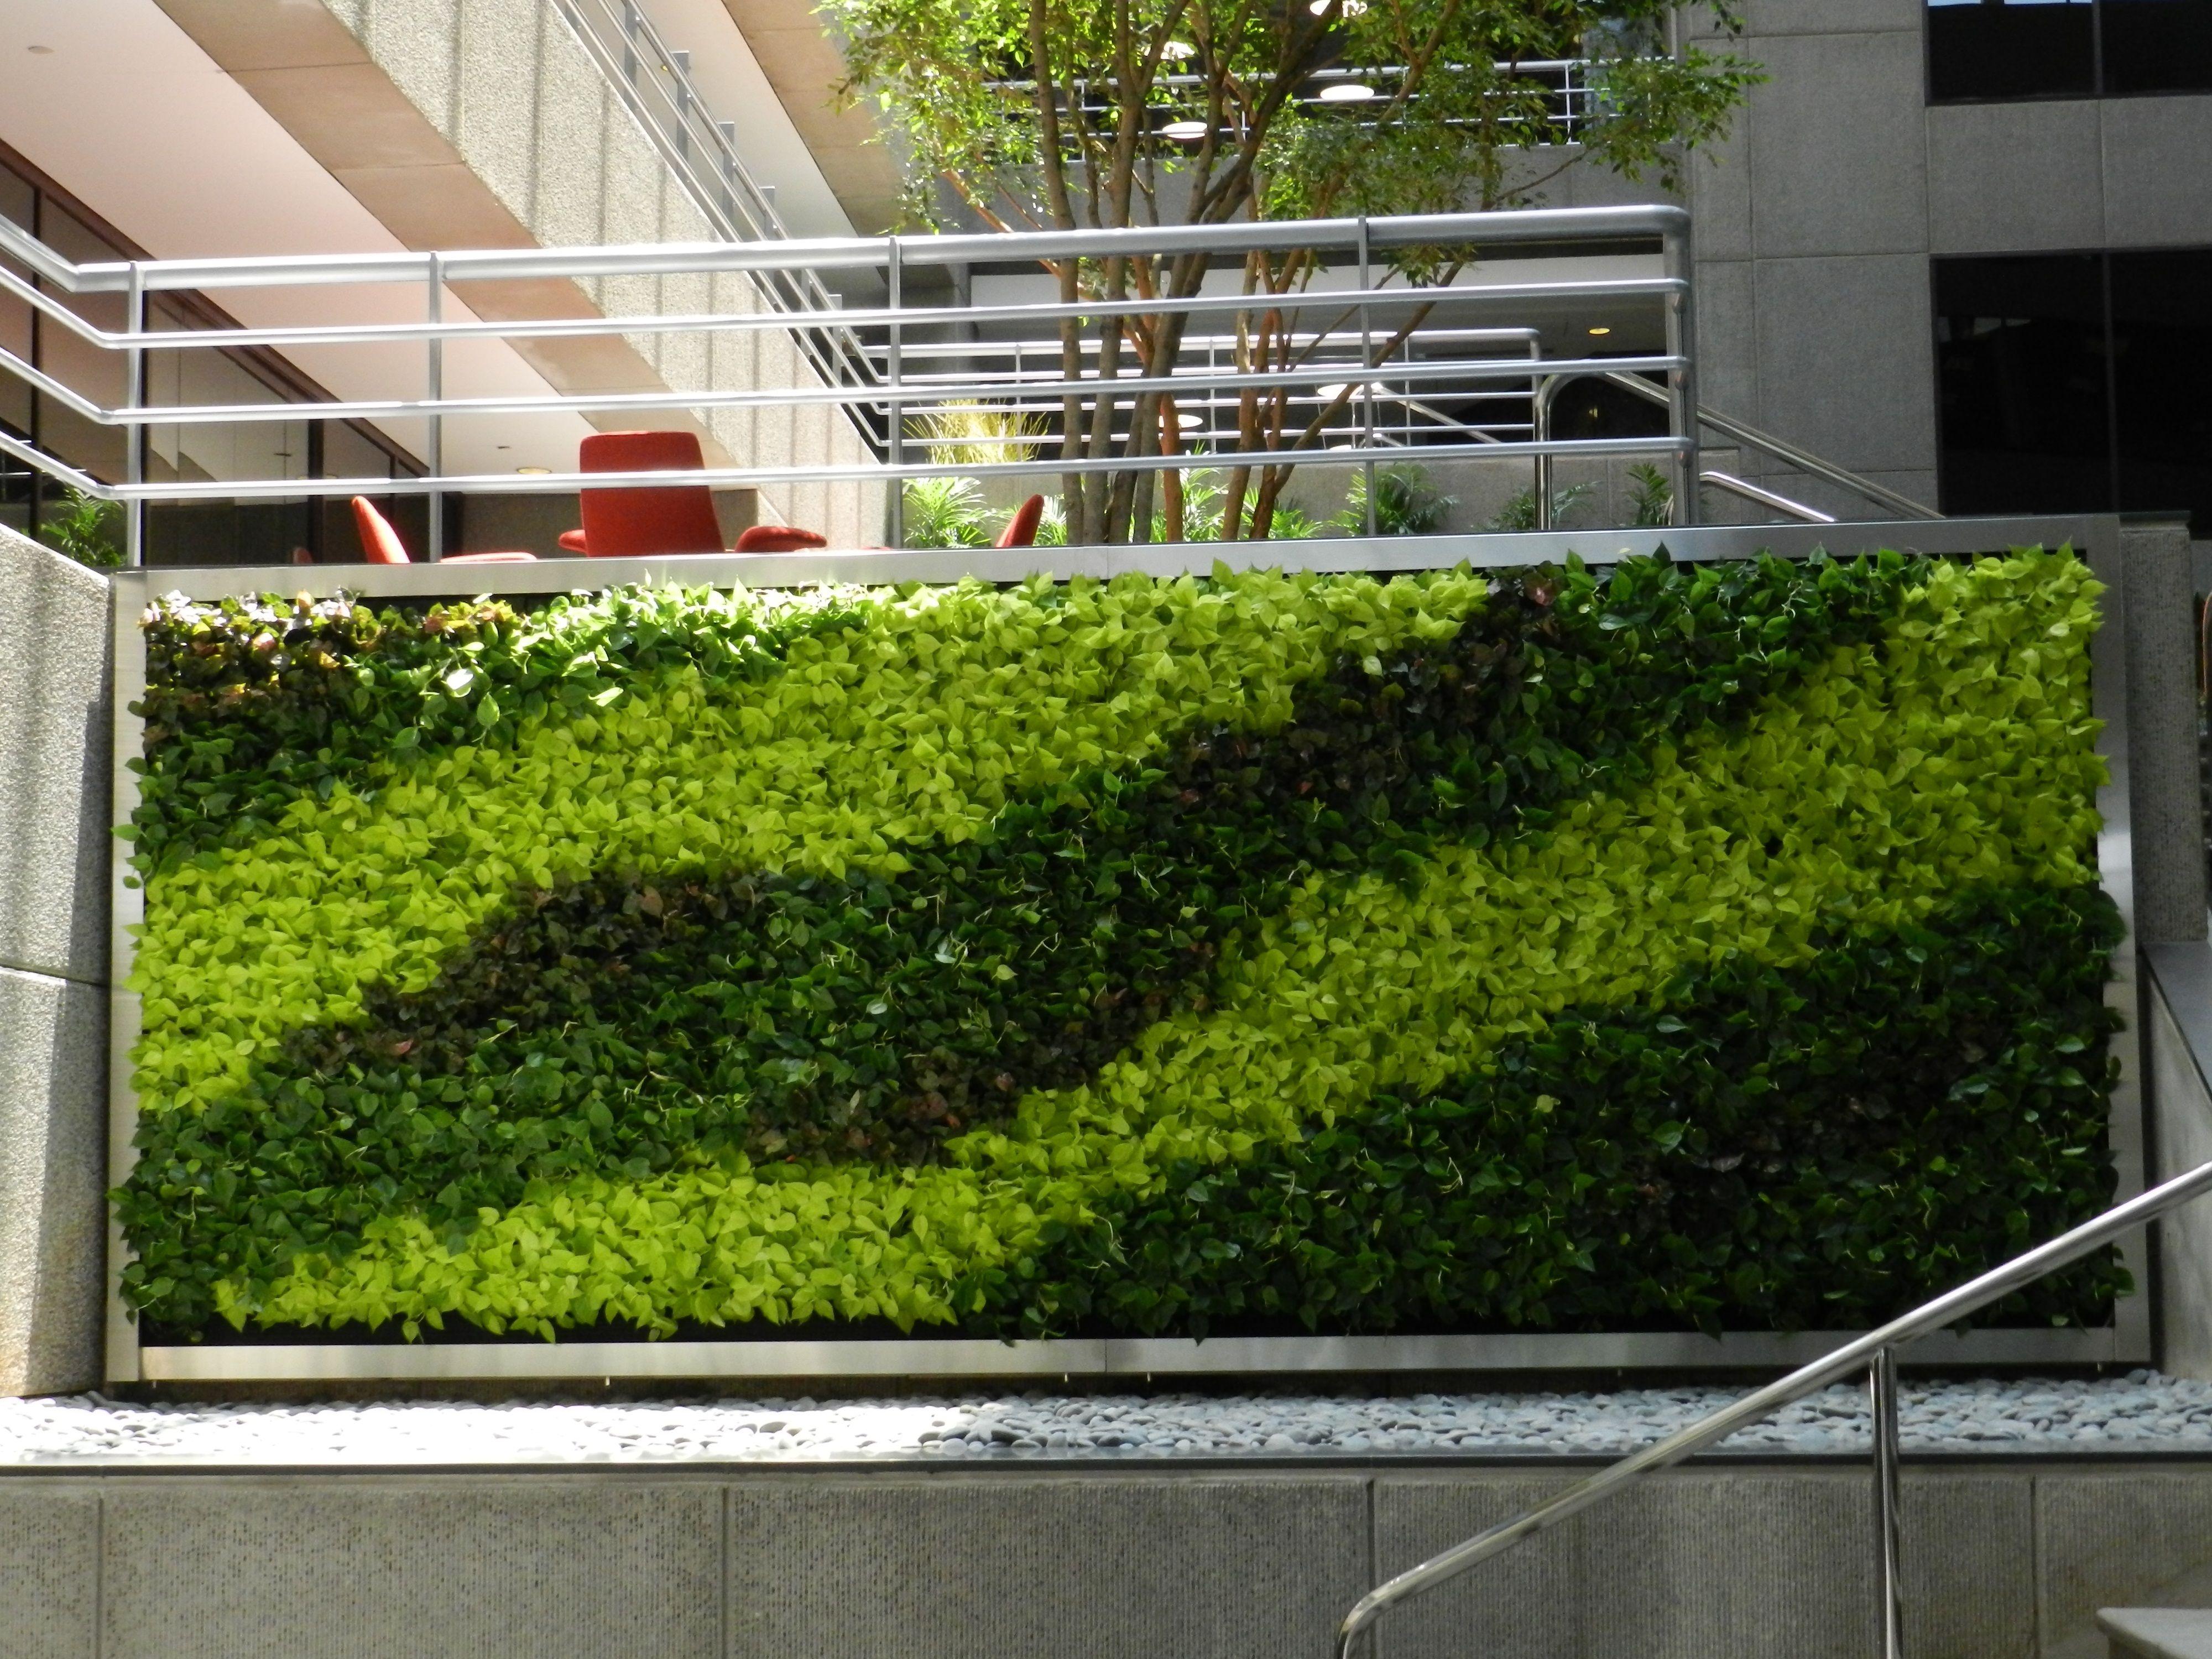 Green Wall (Vertical Garden) Design Outside Office Building